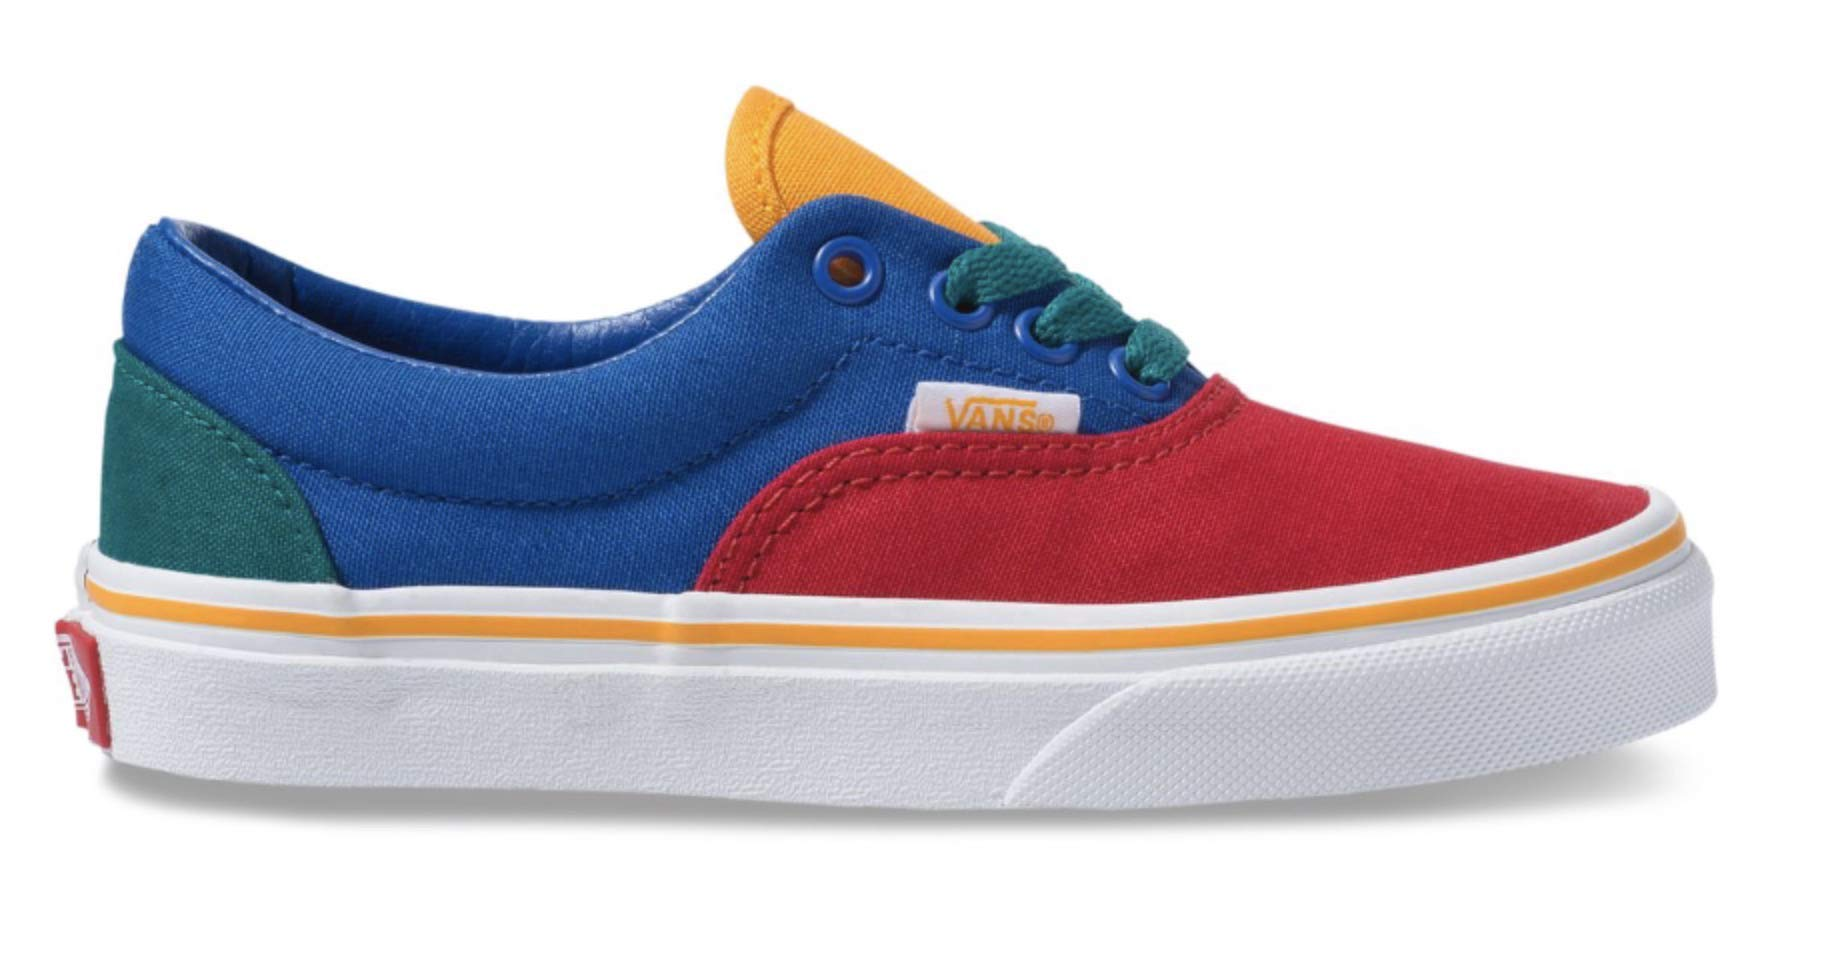 Vans Boy's Primary Block Era Kids Skate Shoes (11.5 M US Little Kid, Lapis Blue/True White)